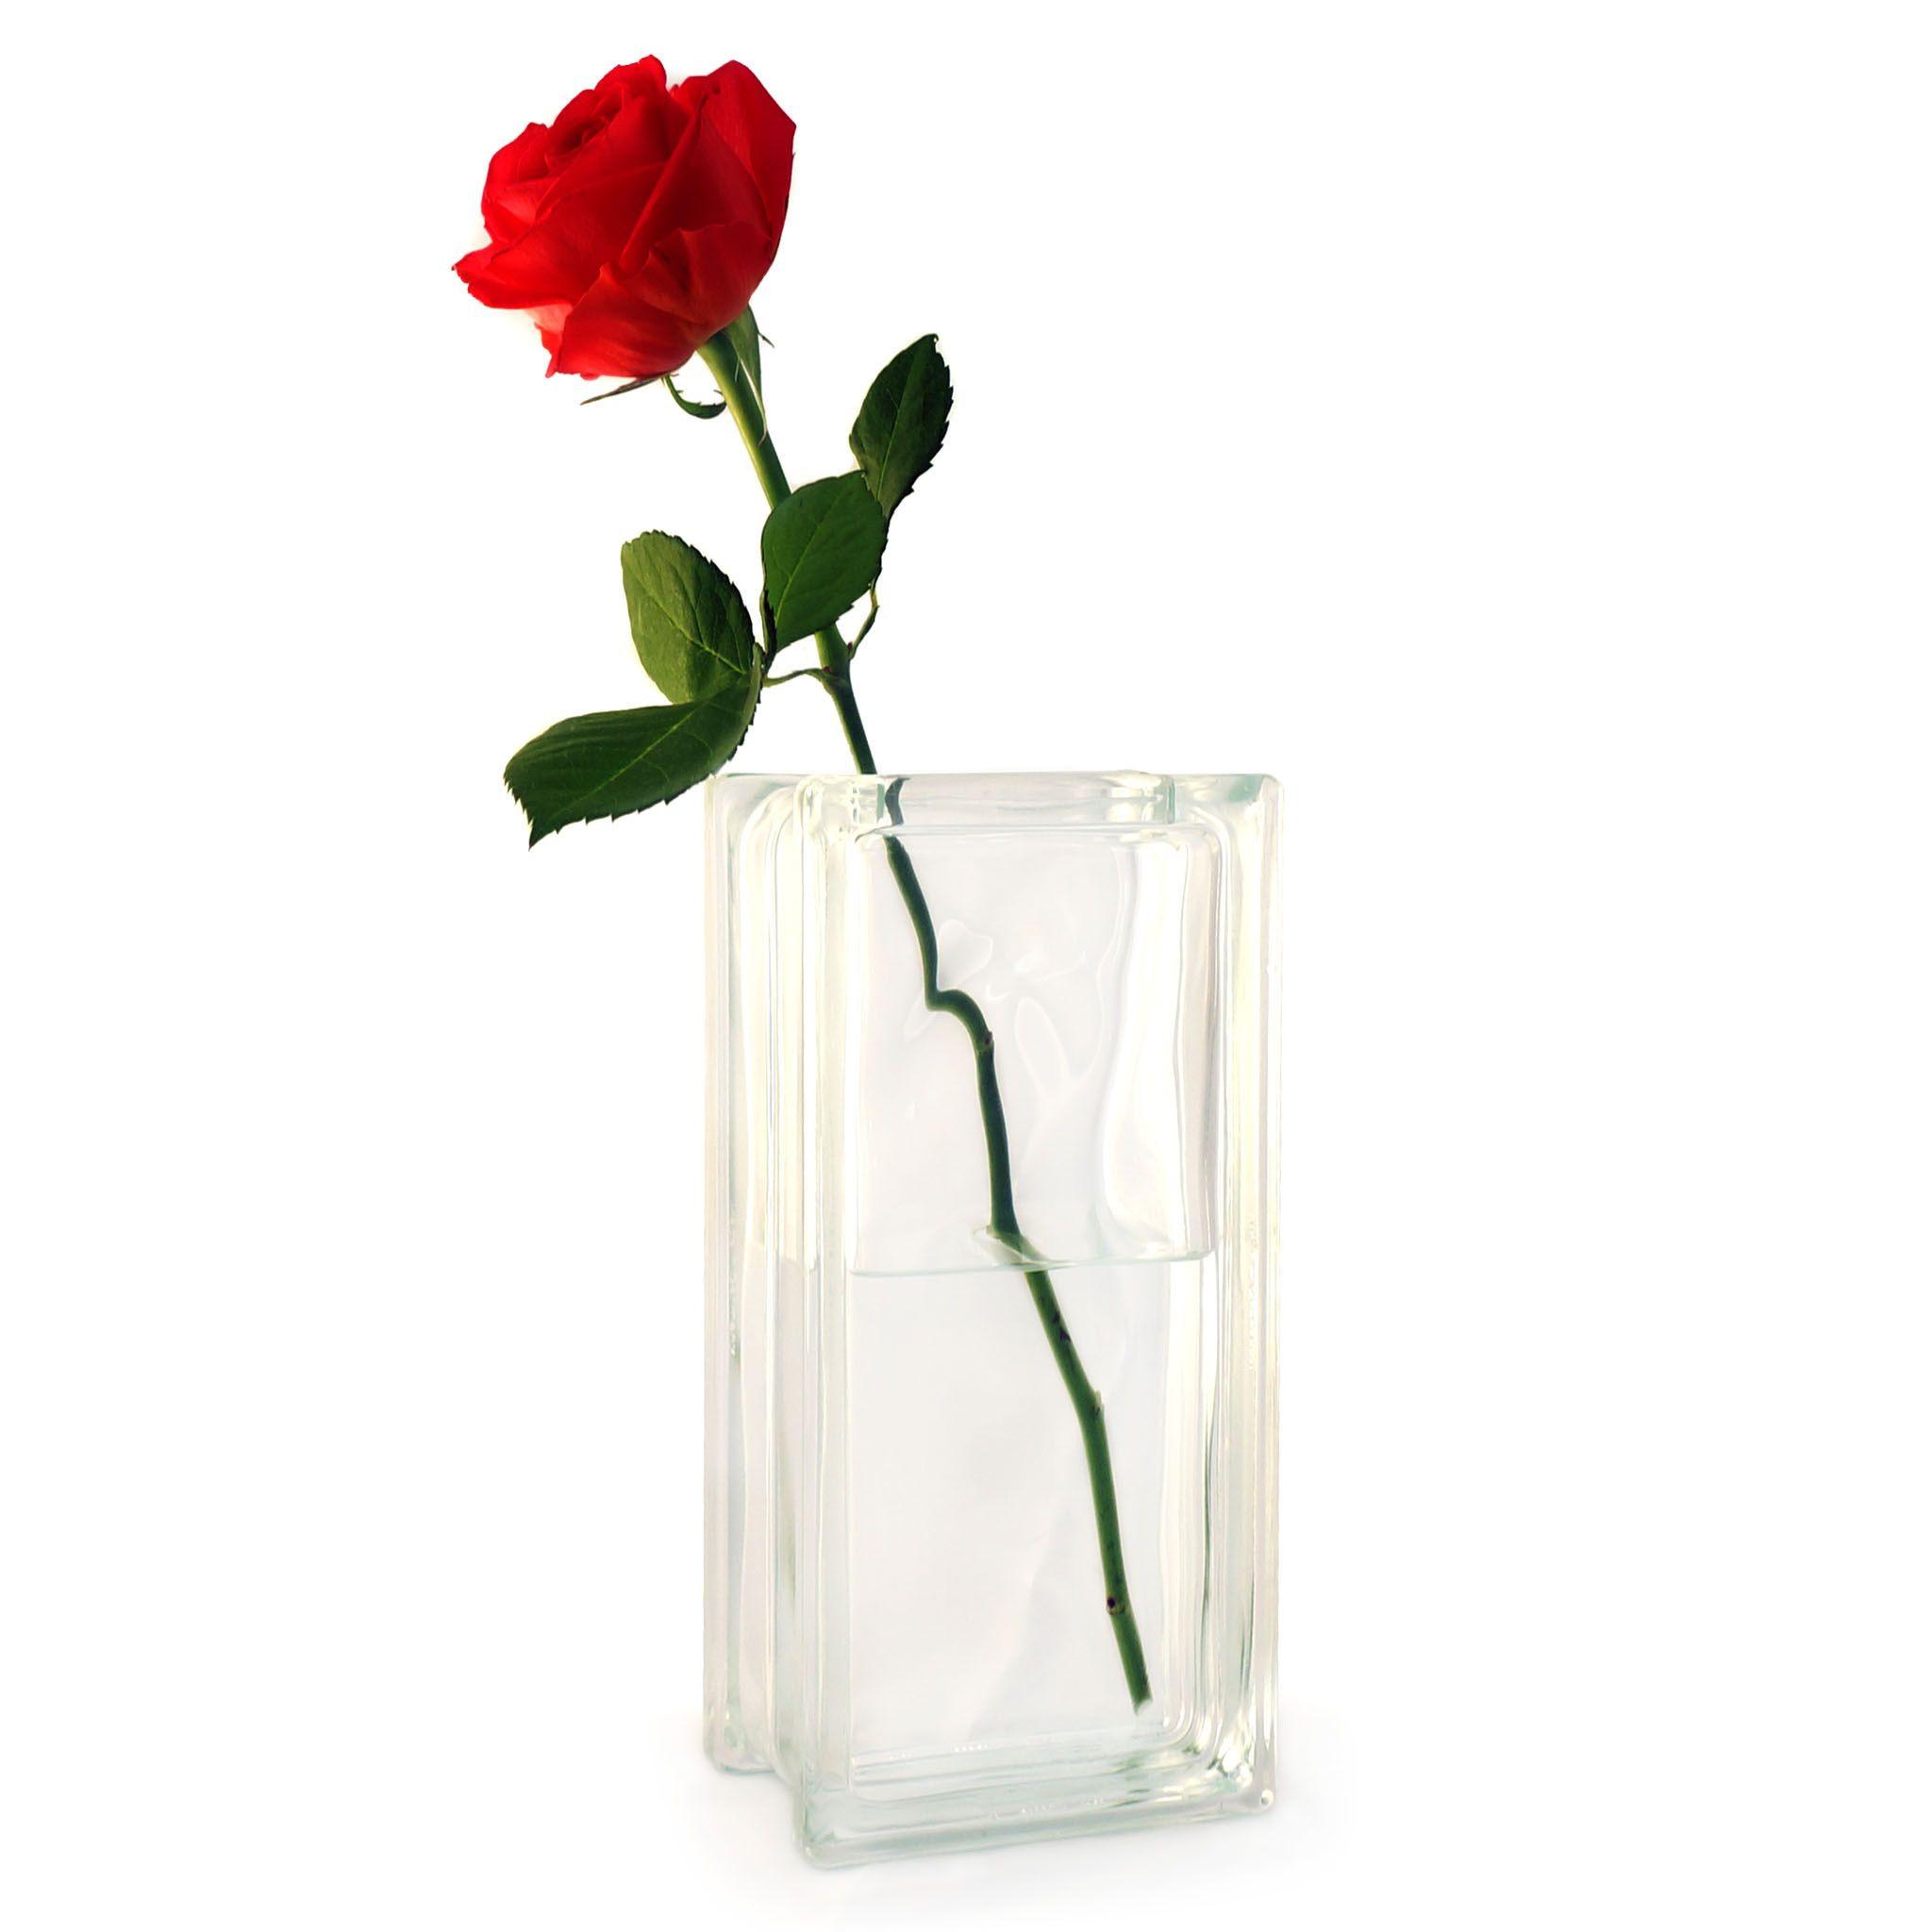 Single Rose Glass Vase Of Rose In A Vase Garden Design Ideas with Single Red Rose In A Gl Block Vase Lovely Gift for